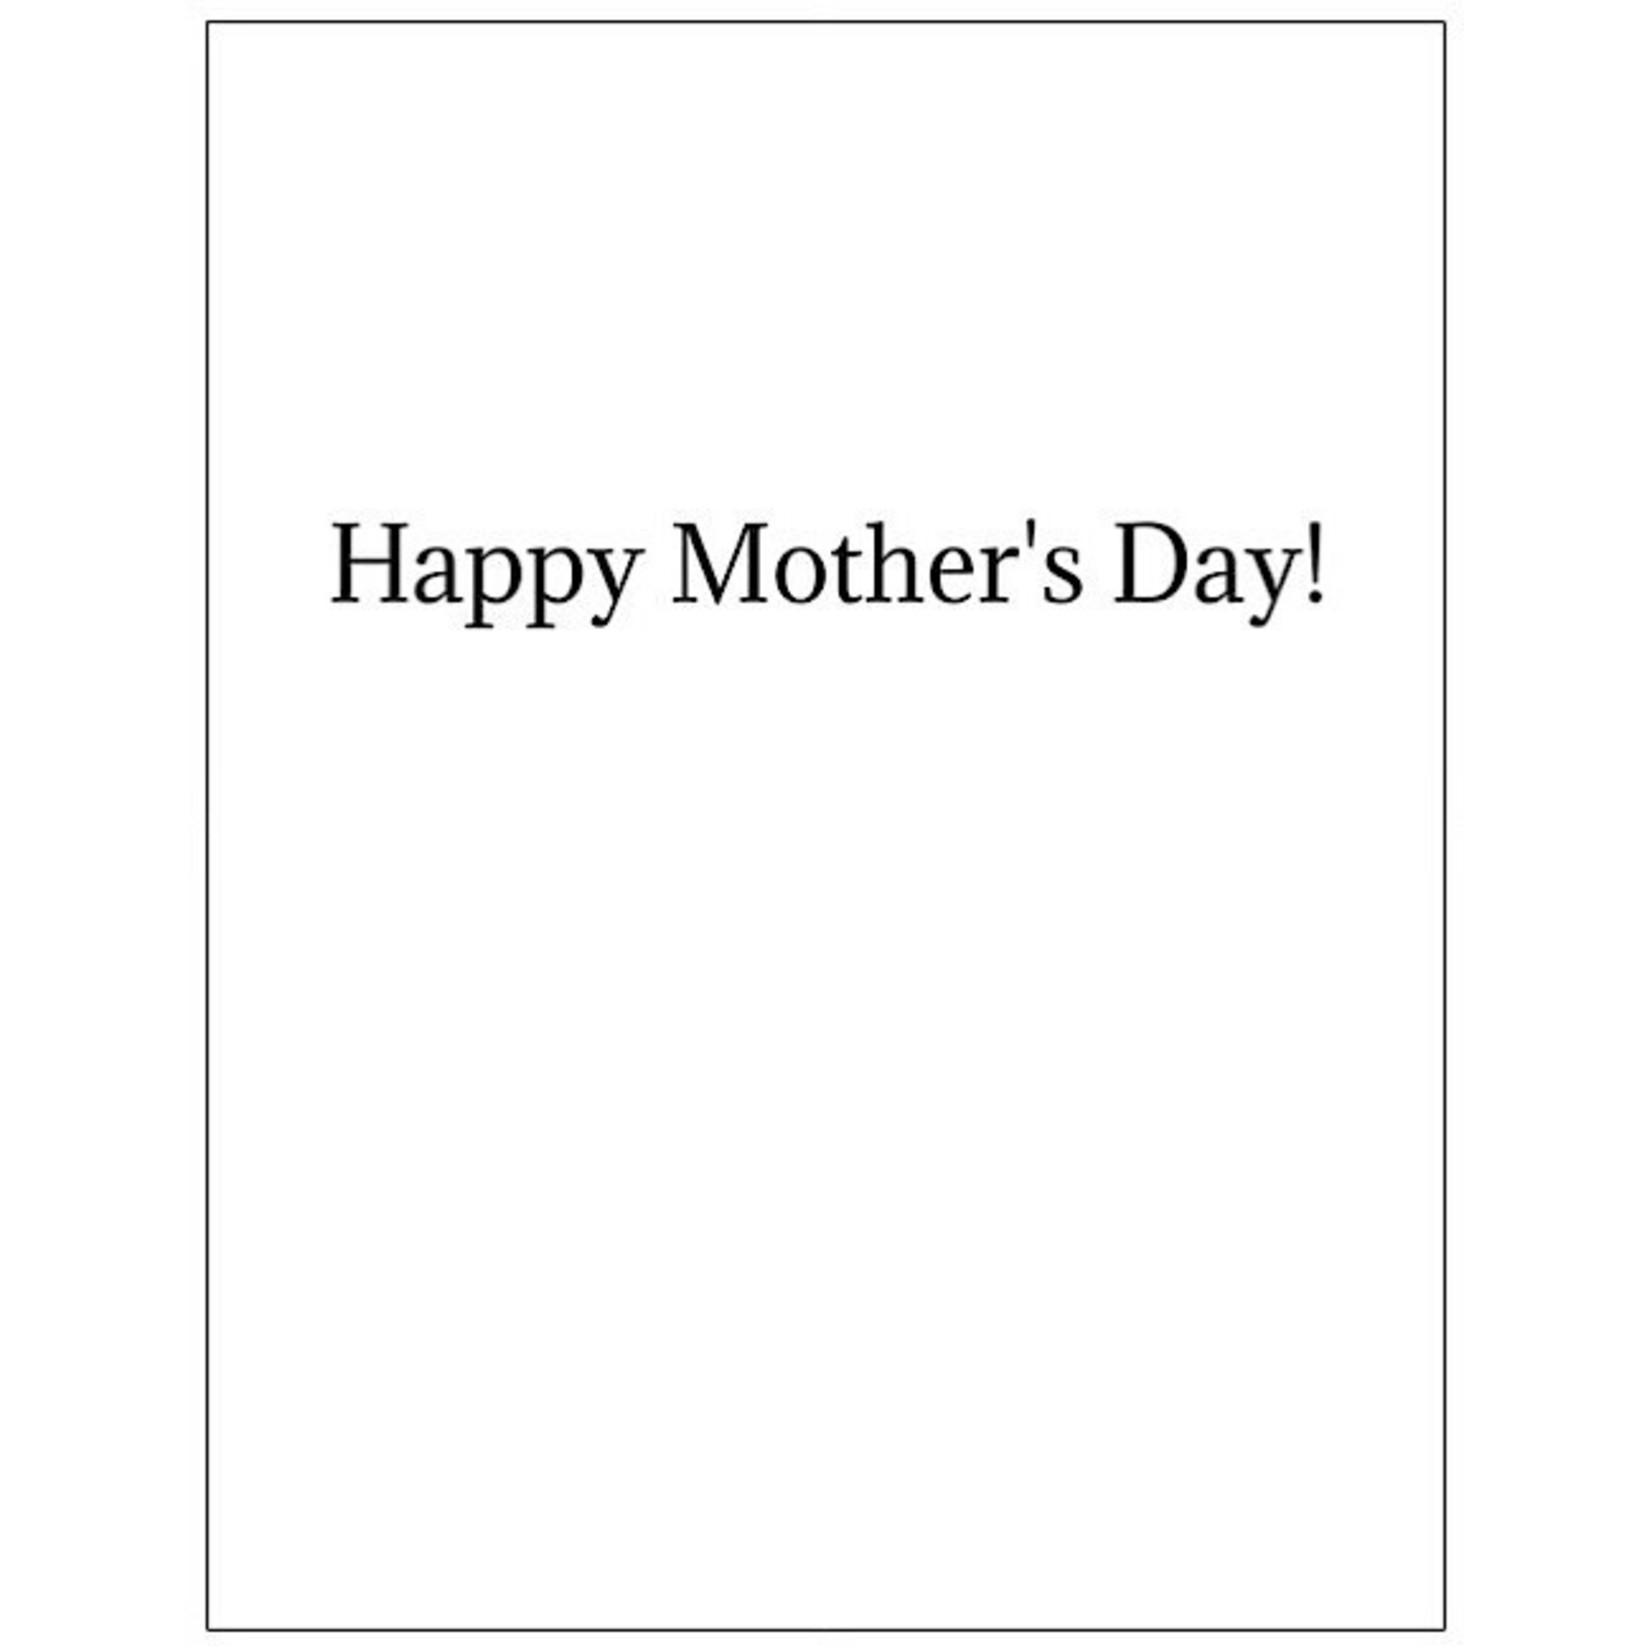 Bad Annie's Card #MD02 - Dear Mom, Please Accept This Card In Lieu Of Grandchildren